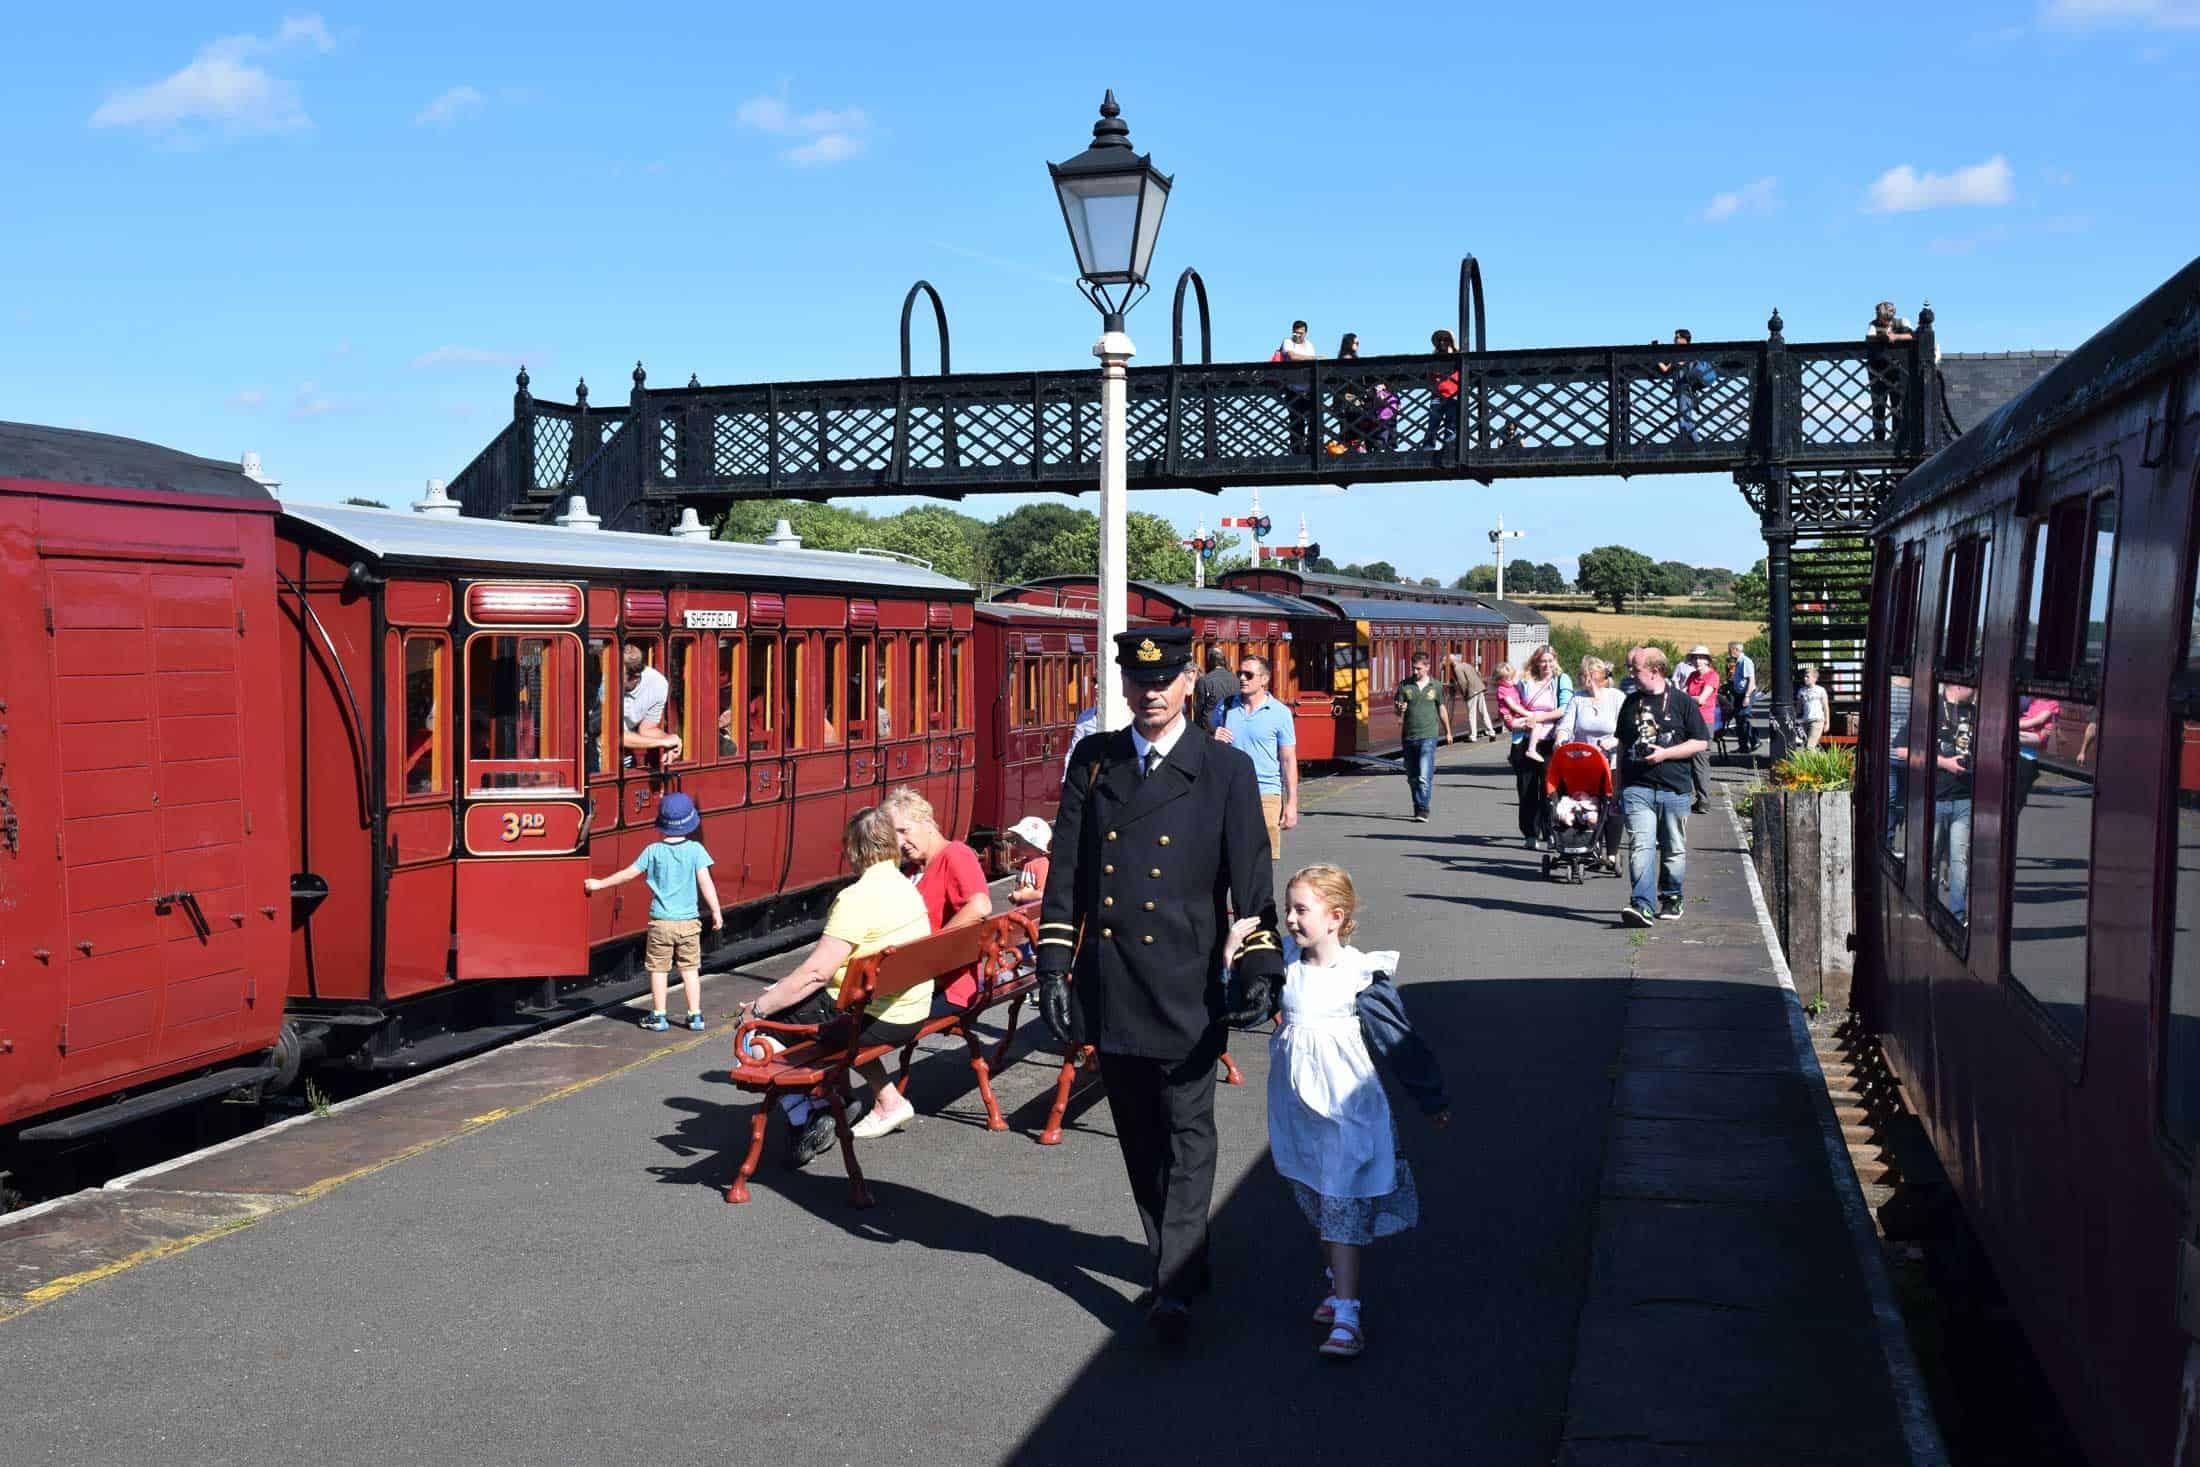 Butterley Railway